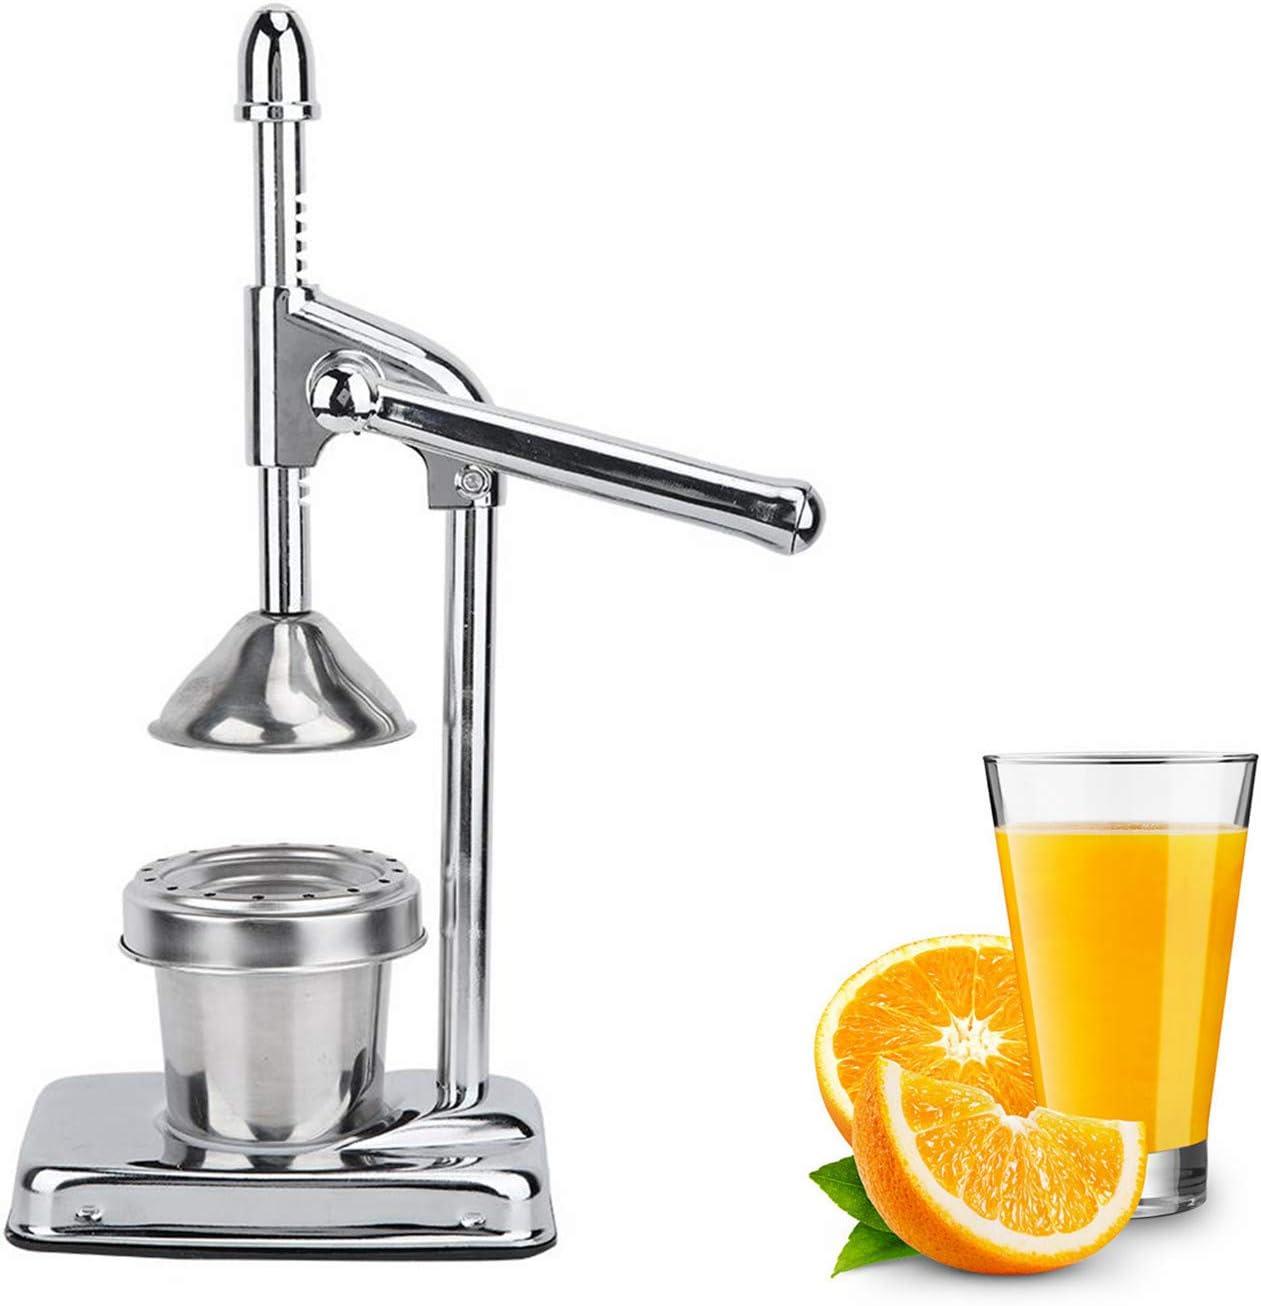 Appearancees Portable Size Stainless Steel Manual Lemon Squeezer Citrus Orange Juice Hand Juicer Screw Press Fresh Squeezed Fruit Tools